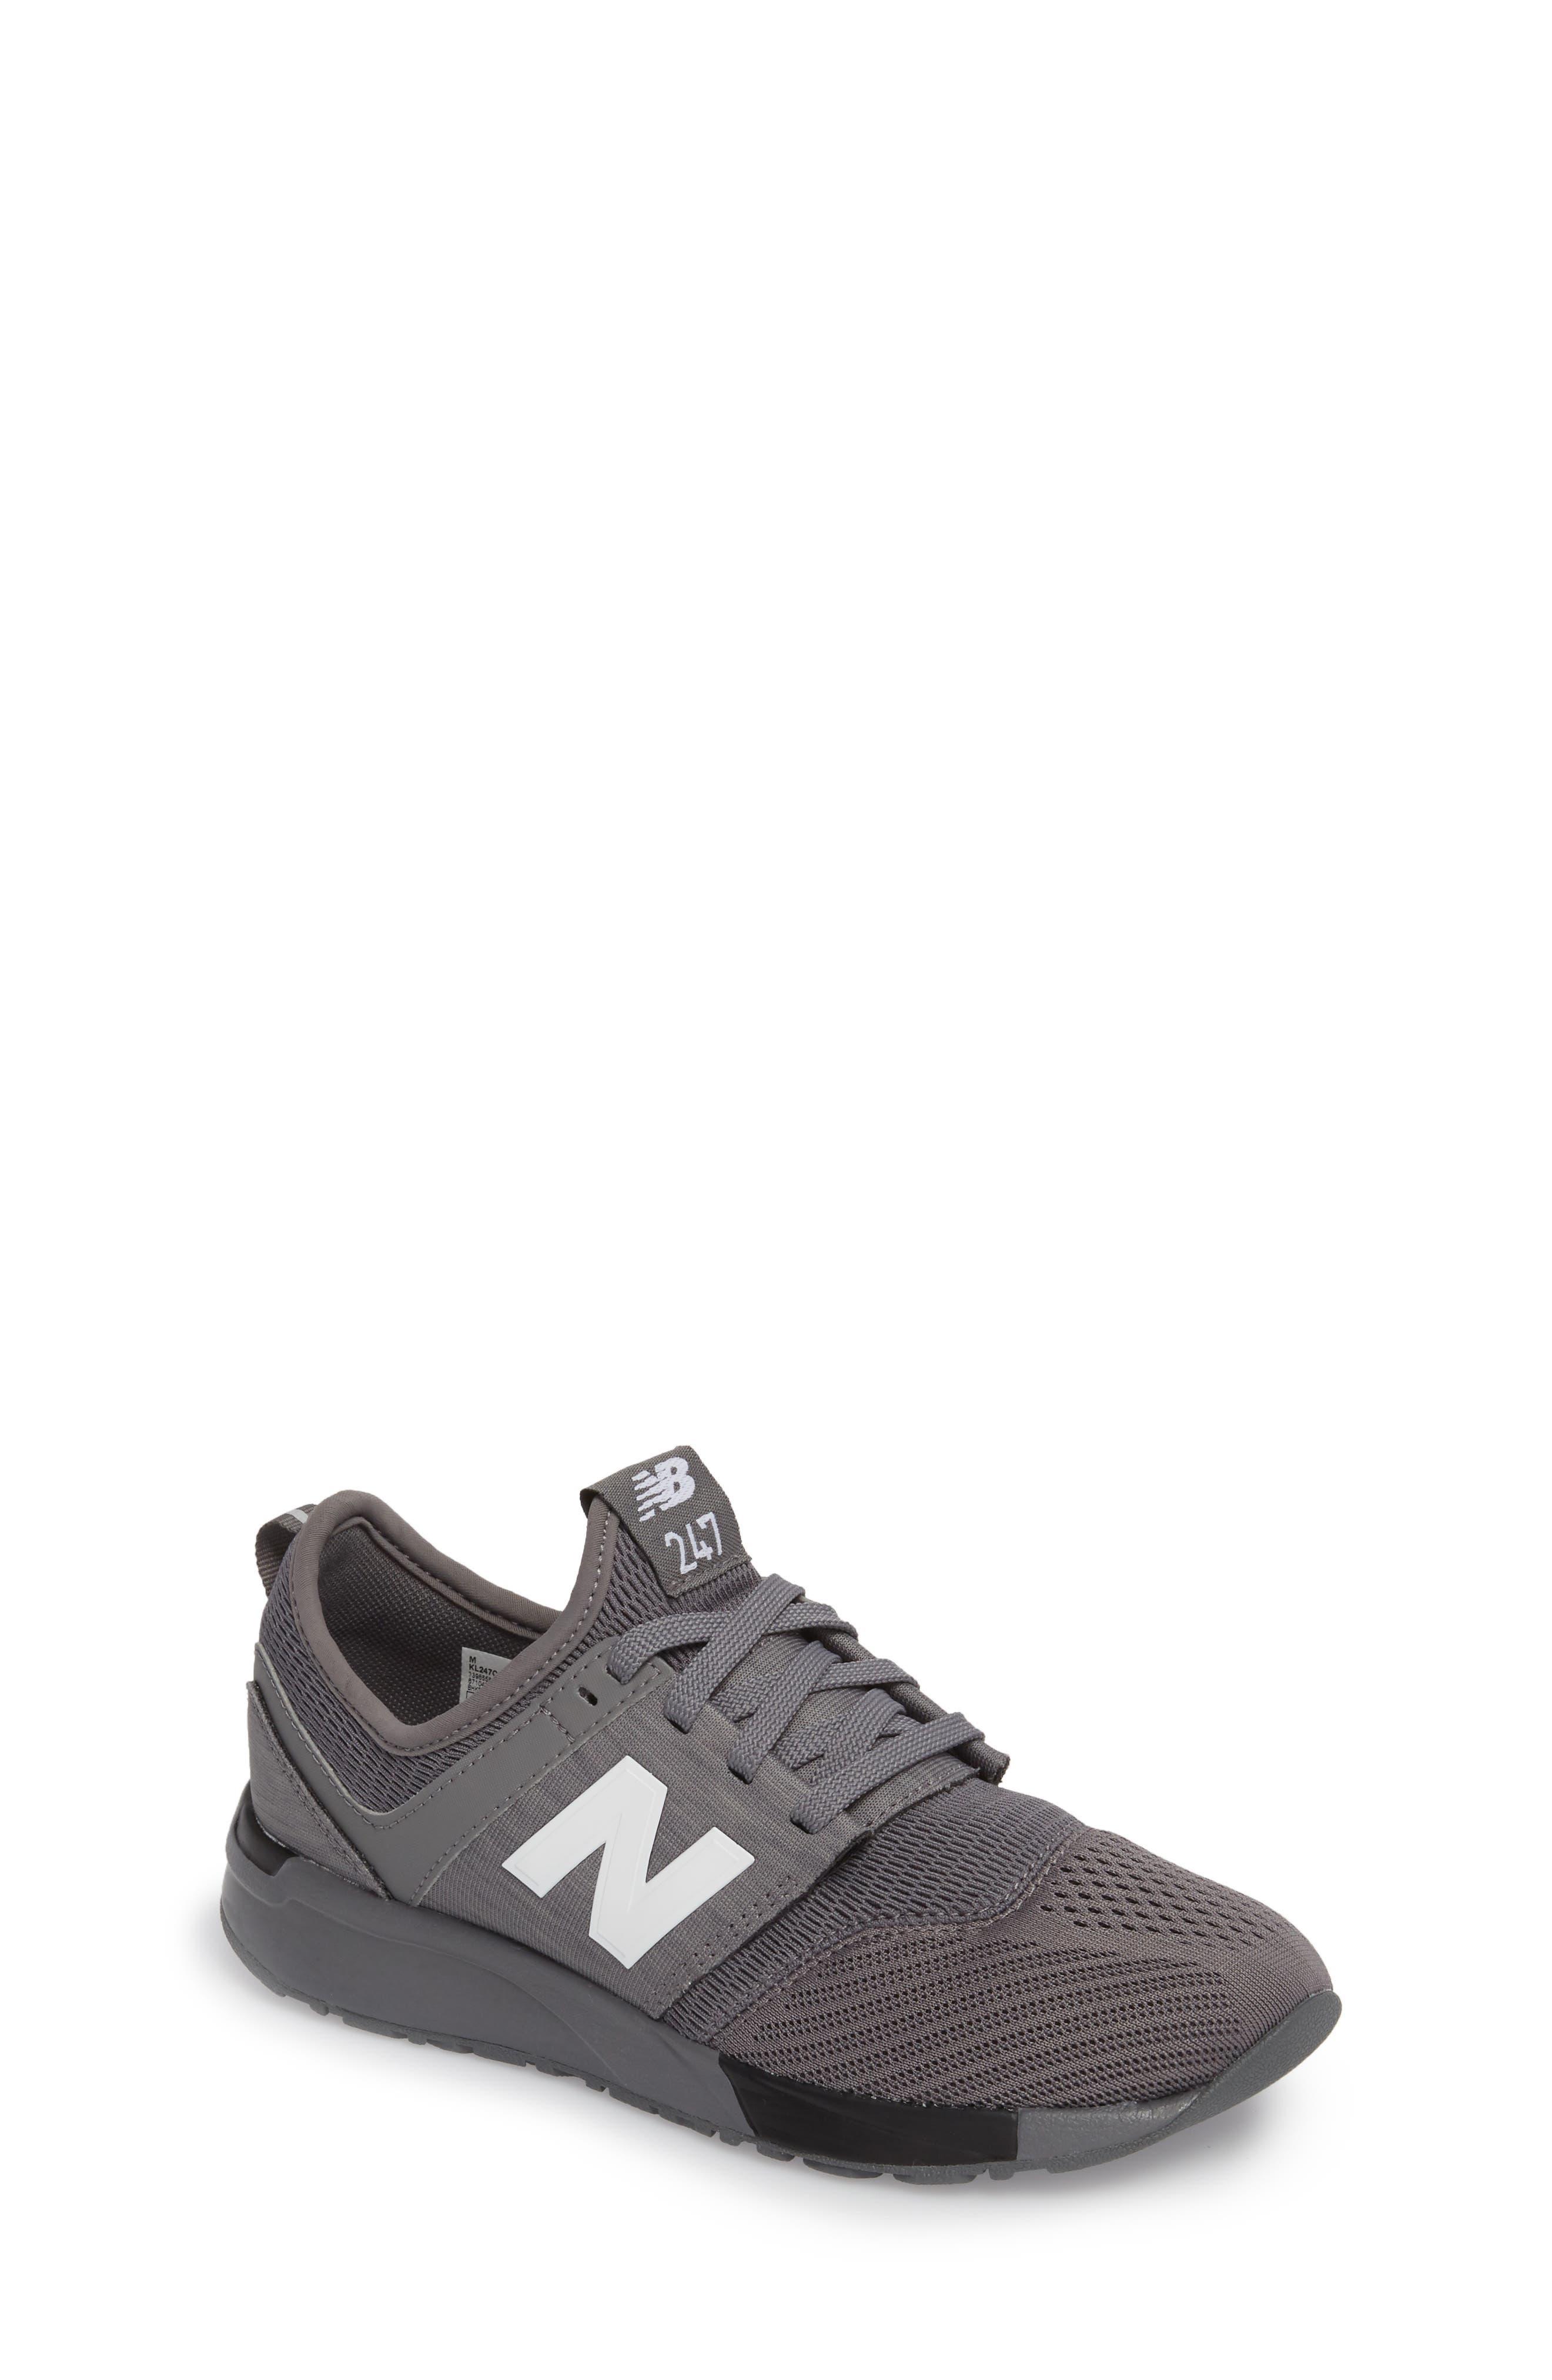 247 Sport Sneaker,                         Main,                         color, Grey/ Black